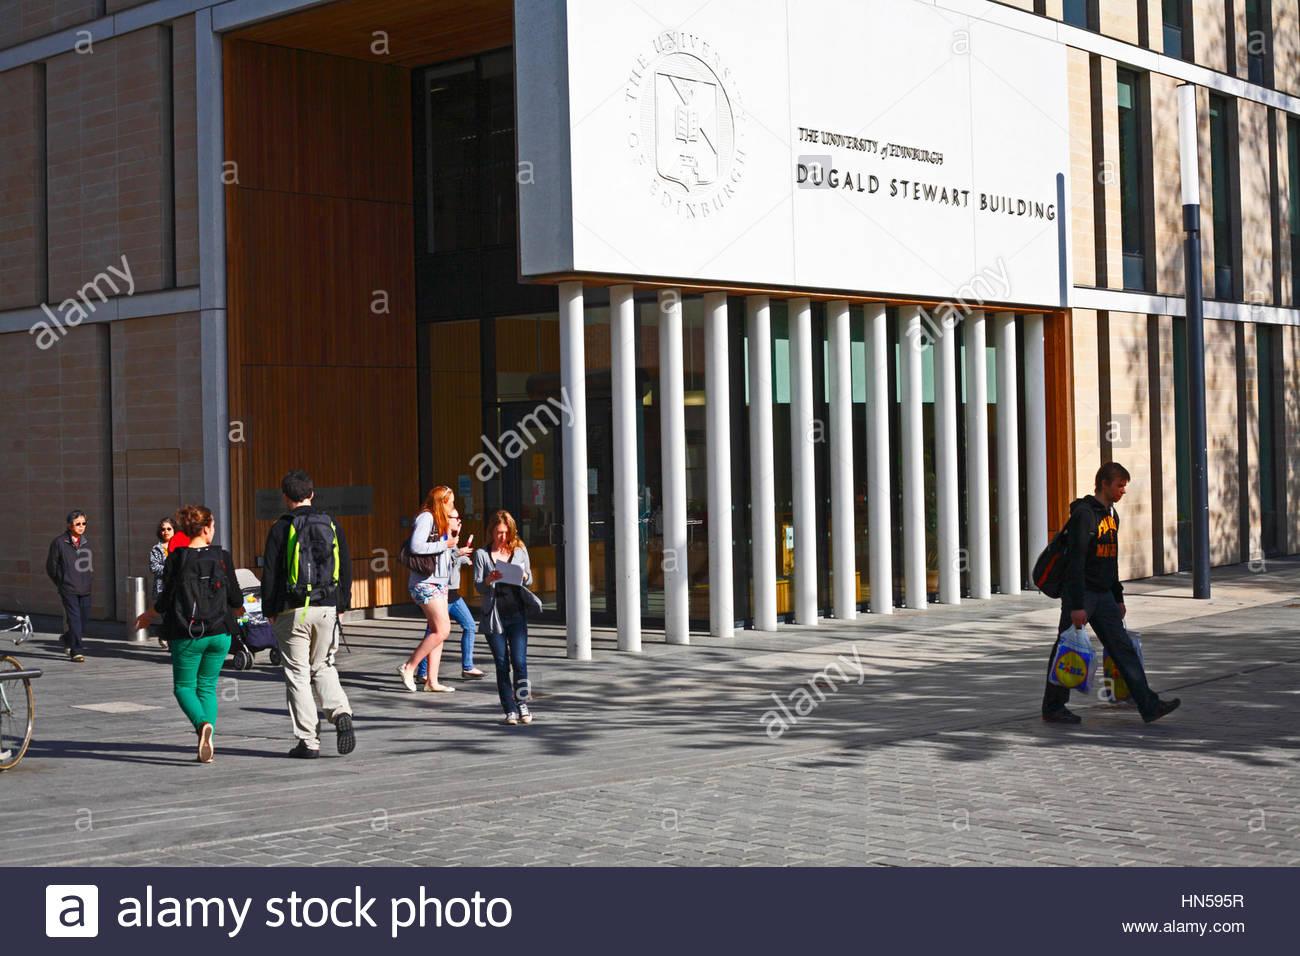 Dugald Stewart building, Edinburgh University - Stock Image